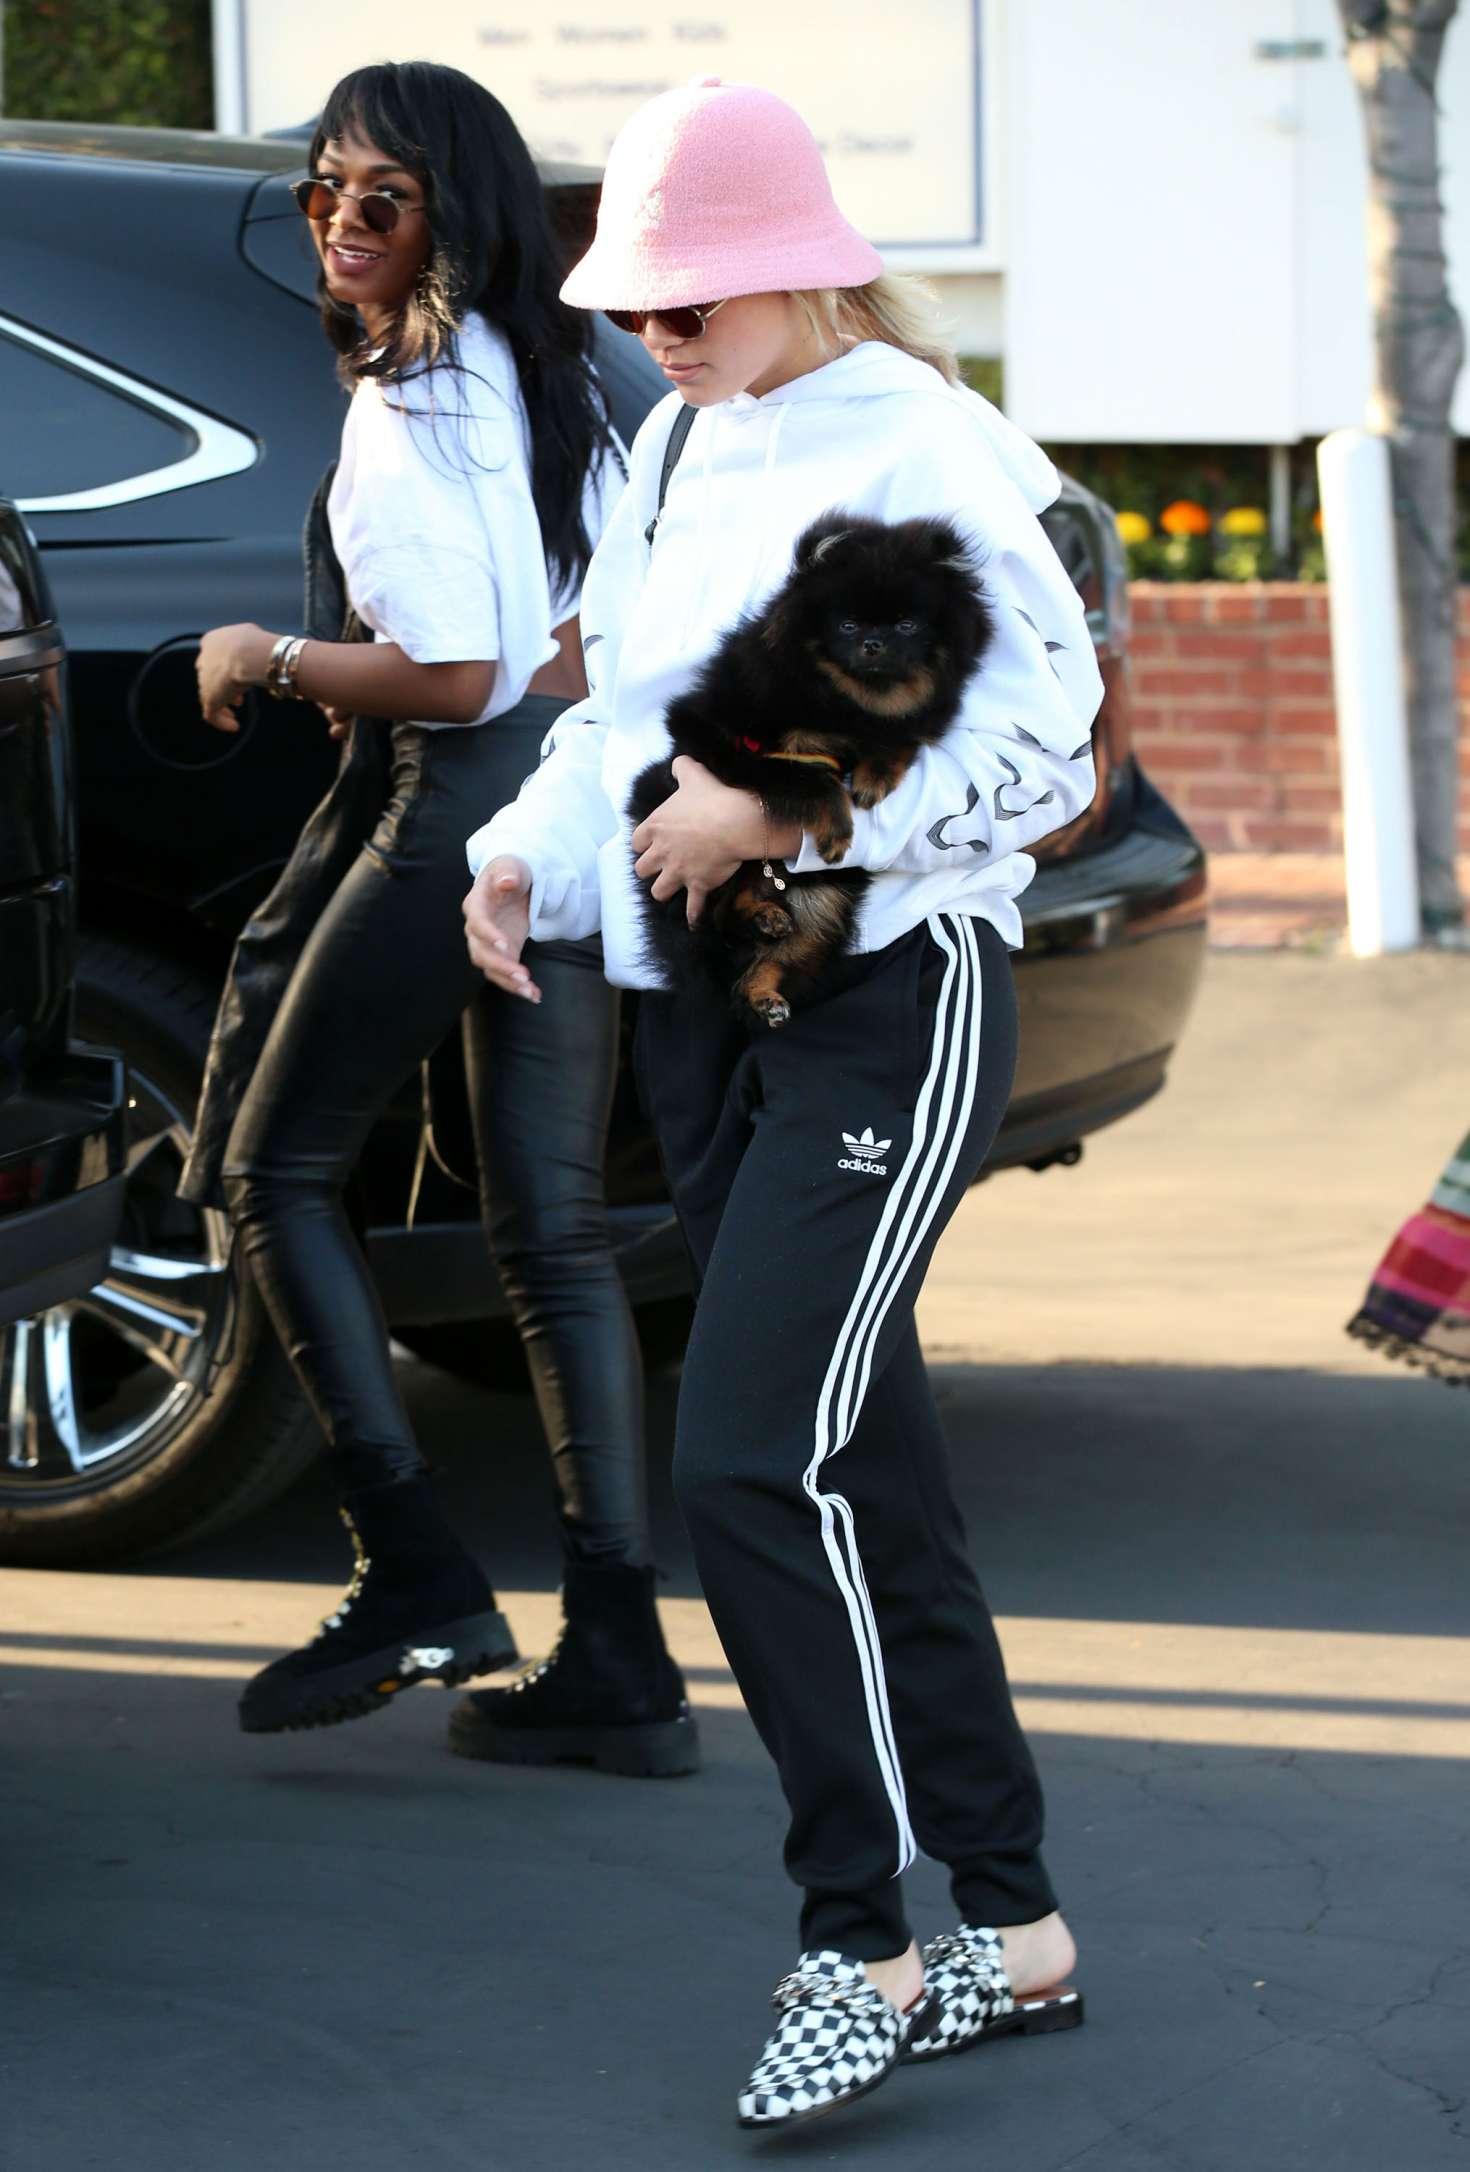 Sofia Richie 2017 : Sofia Richie With a Friend out in LA -09